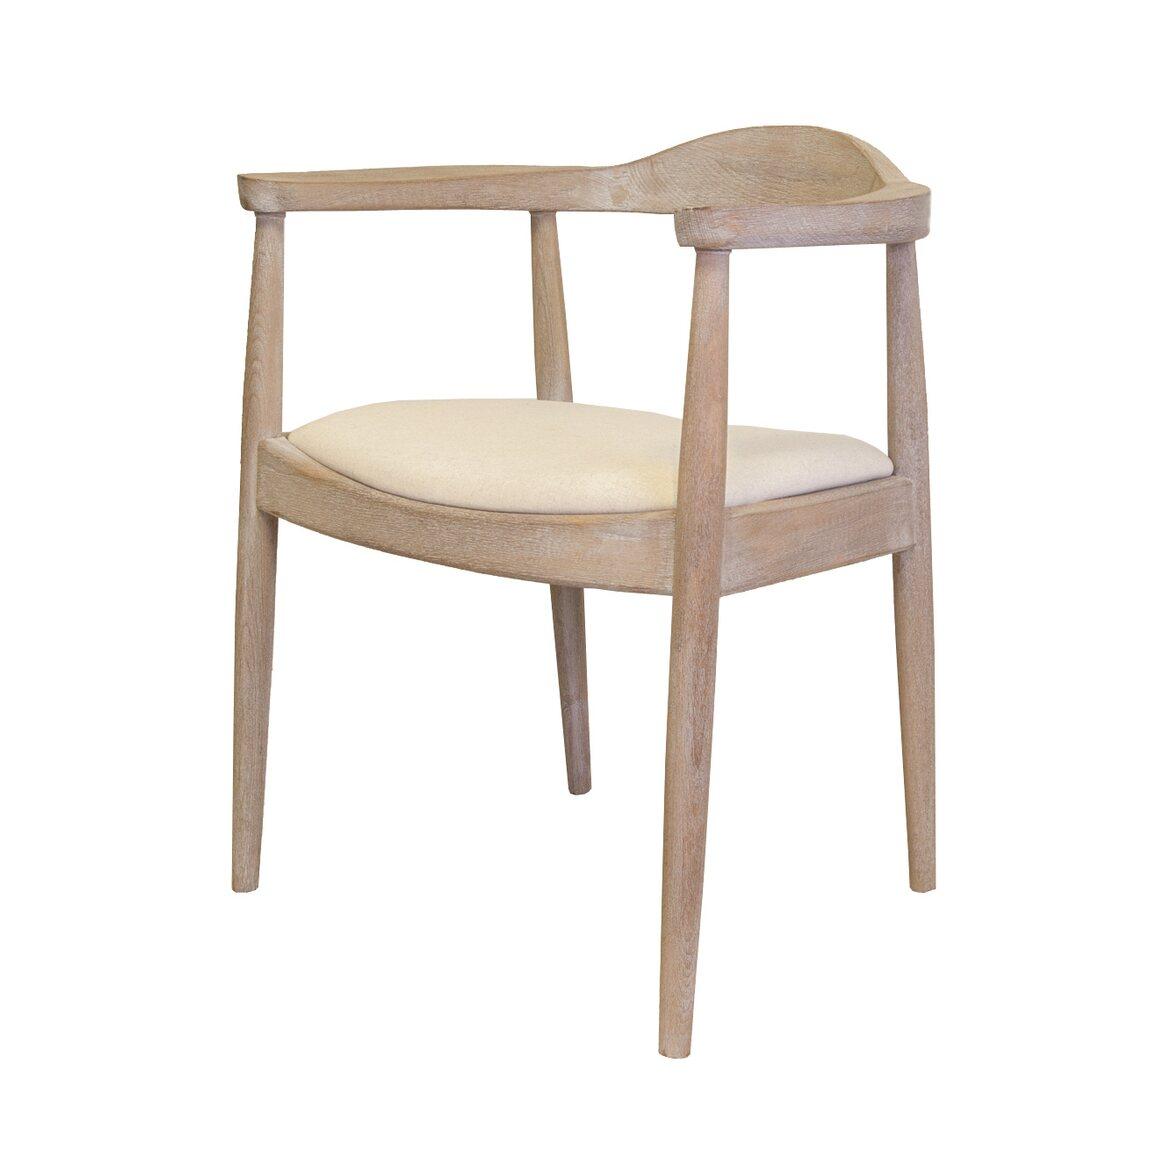 Стул Carlo old 4 | Обеденные стулья Kingsby